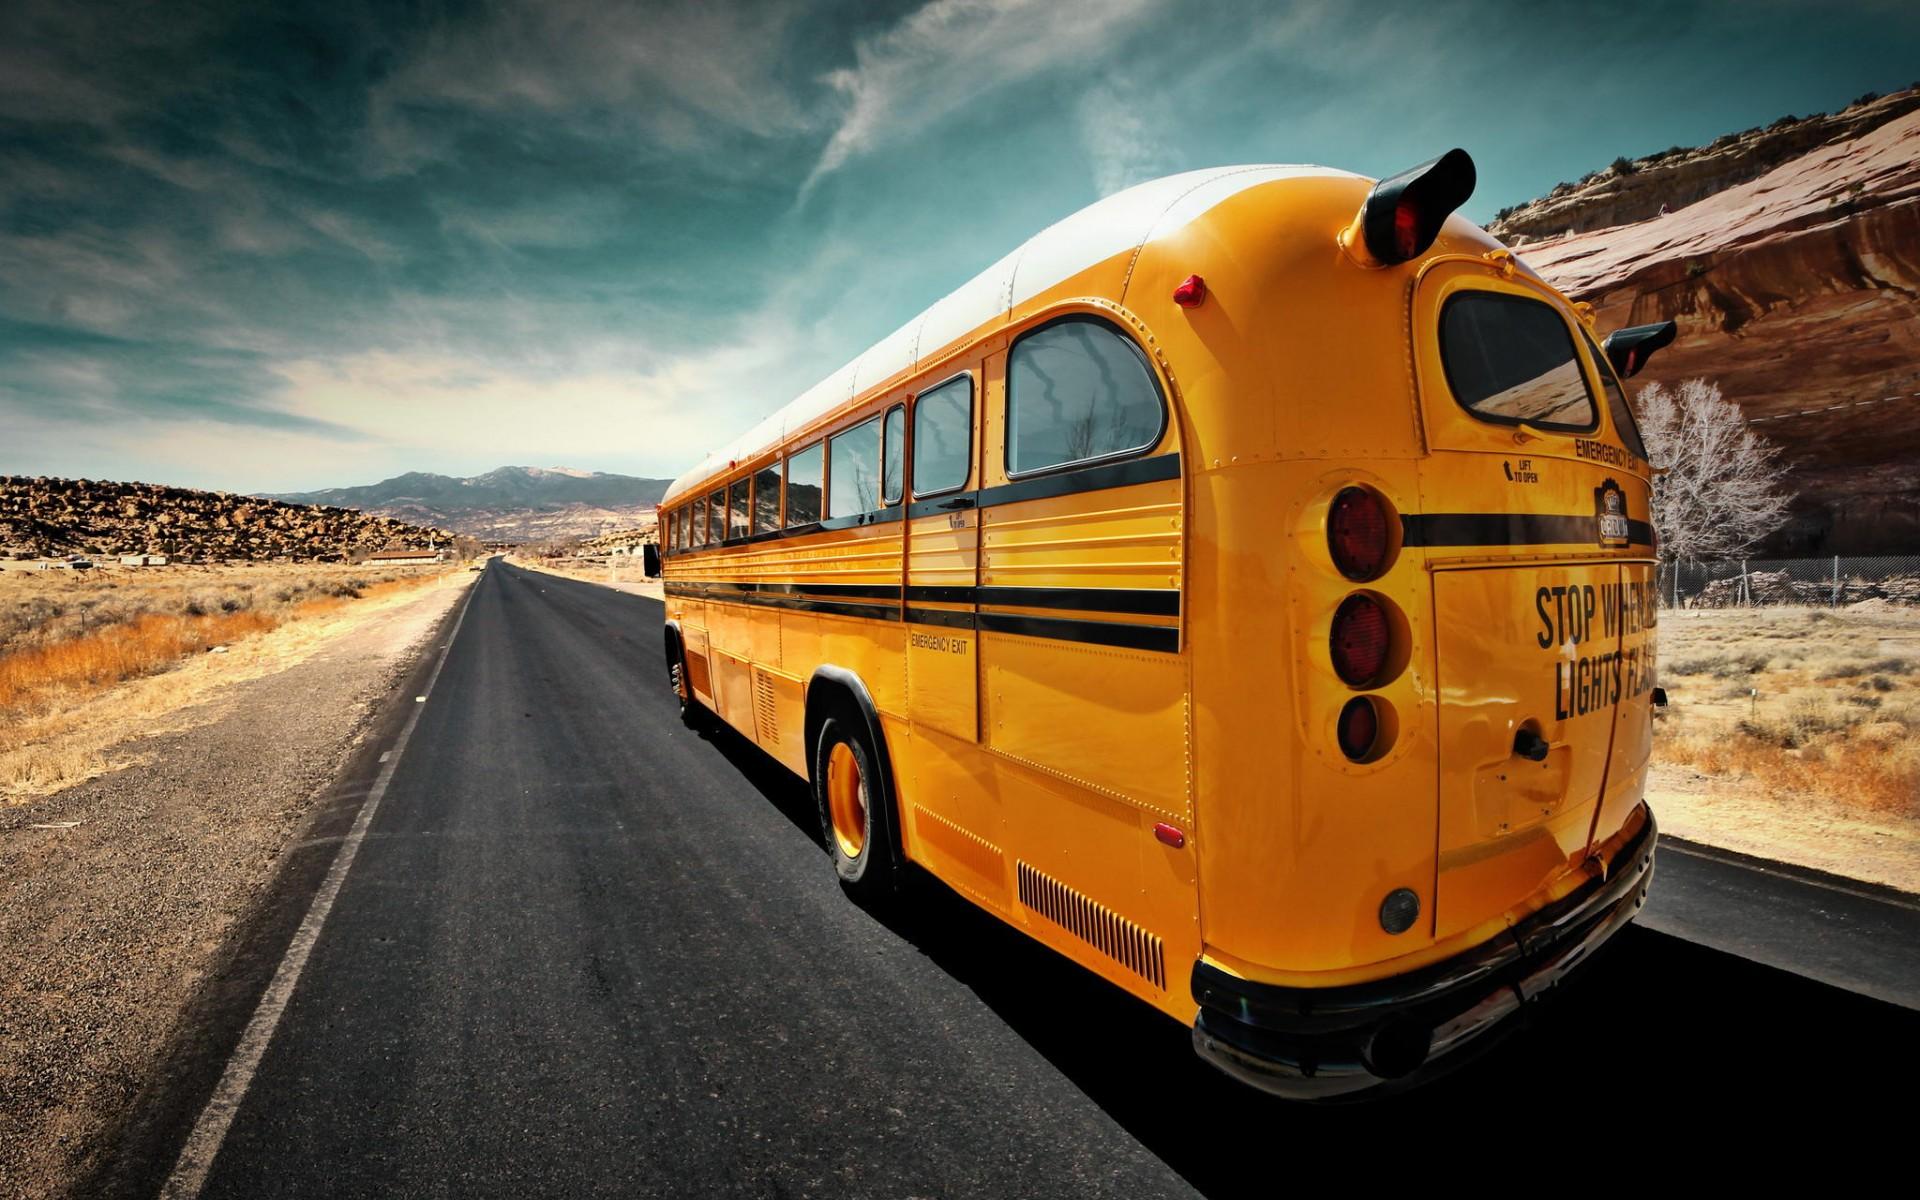 school bus wallpapers hd - photo #8